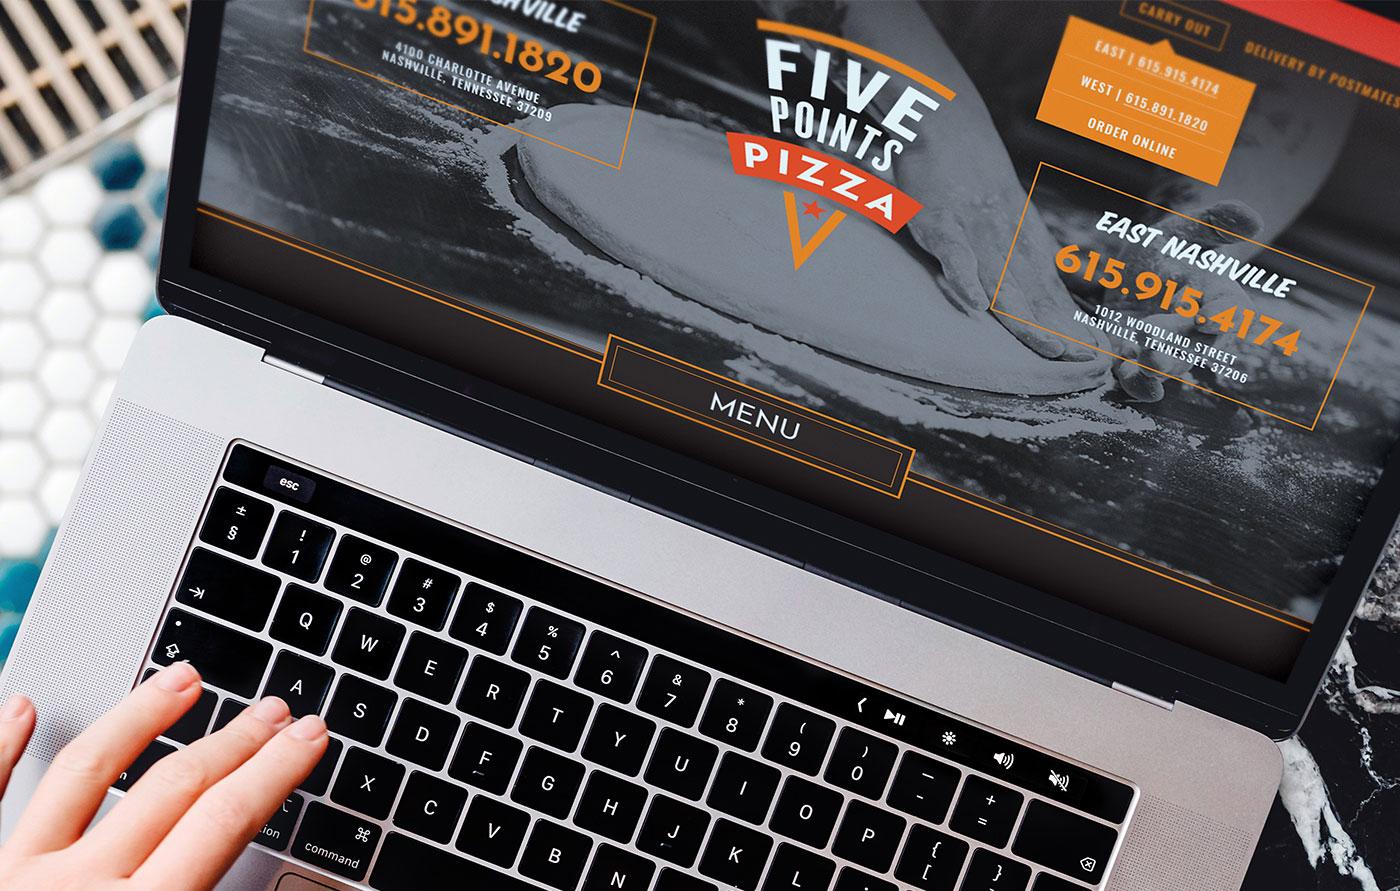 Proof Branding Five Points Pizza UI Design